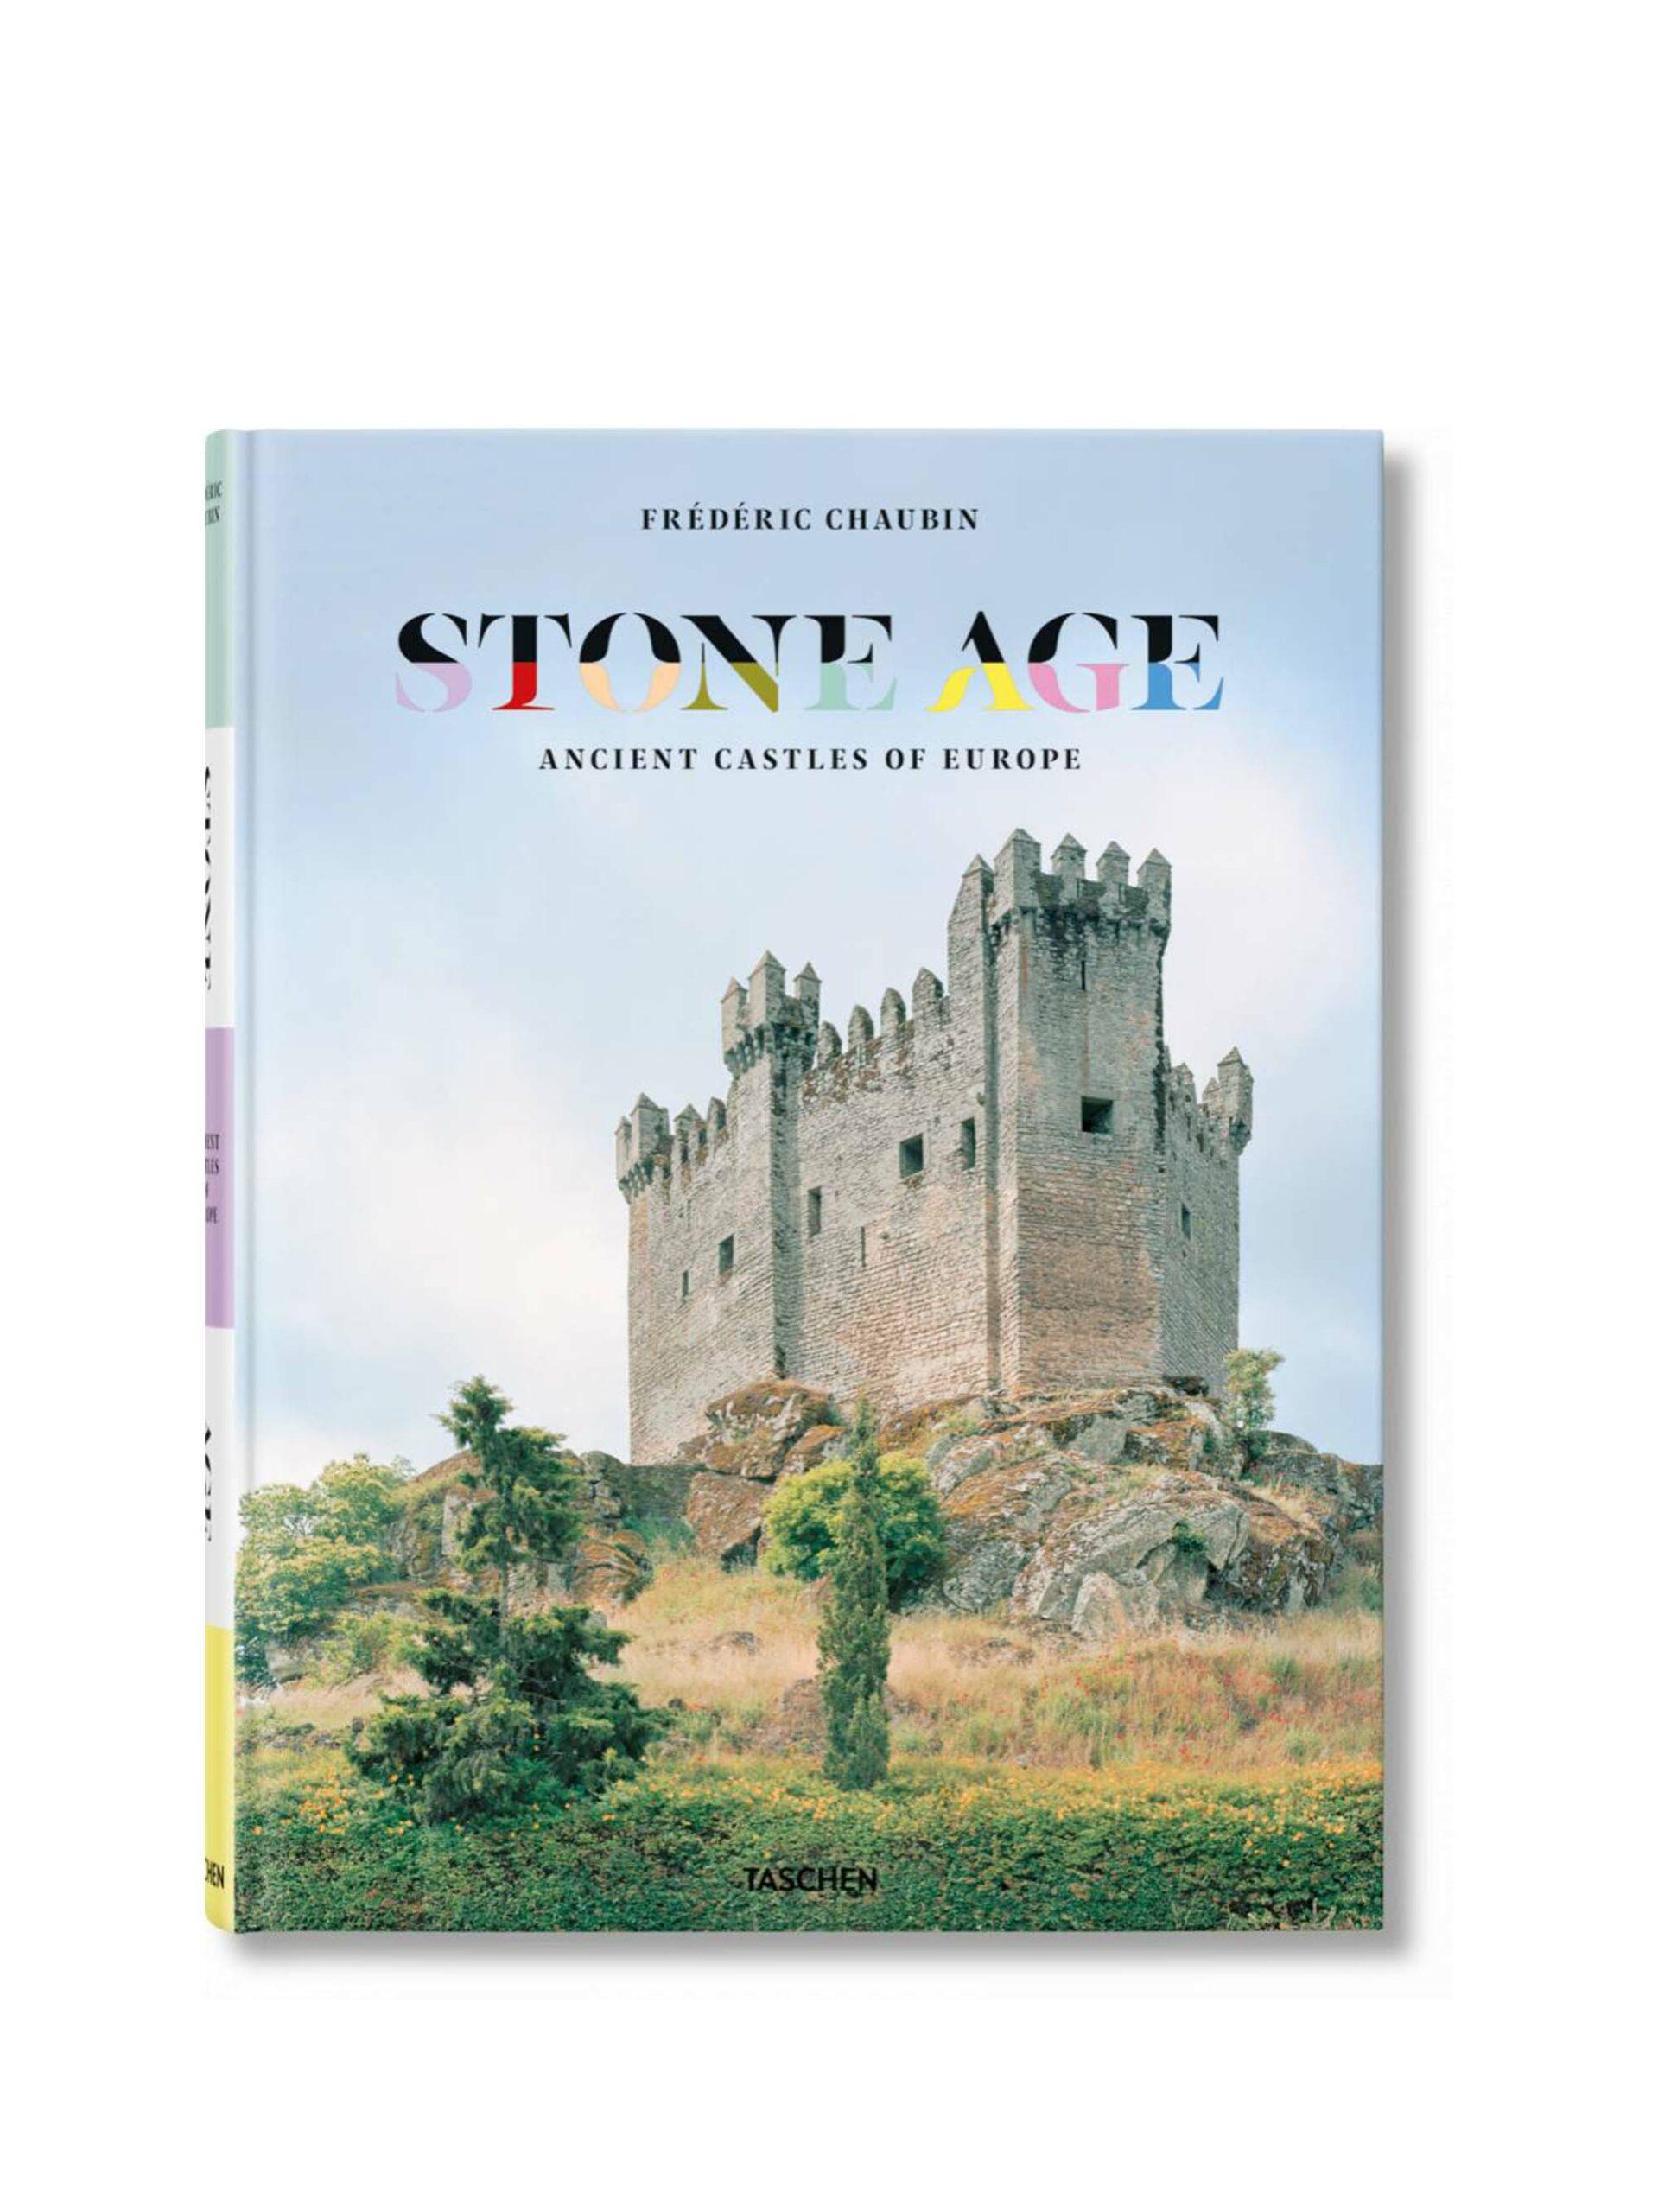 <p class='small-title'>TASCHEN</p>Frédéric Chaubin. Stone Age. Ancient Castles of Europe